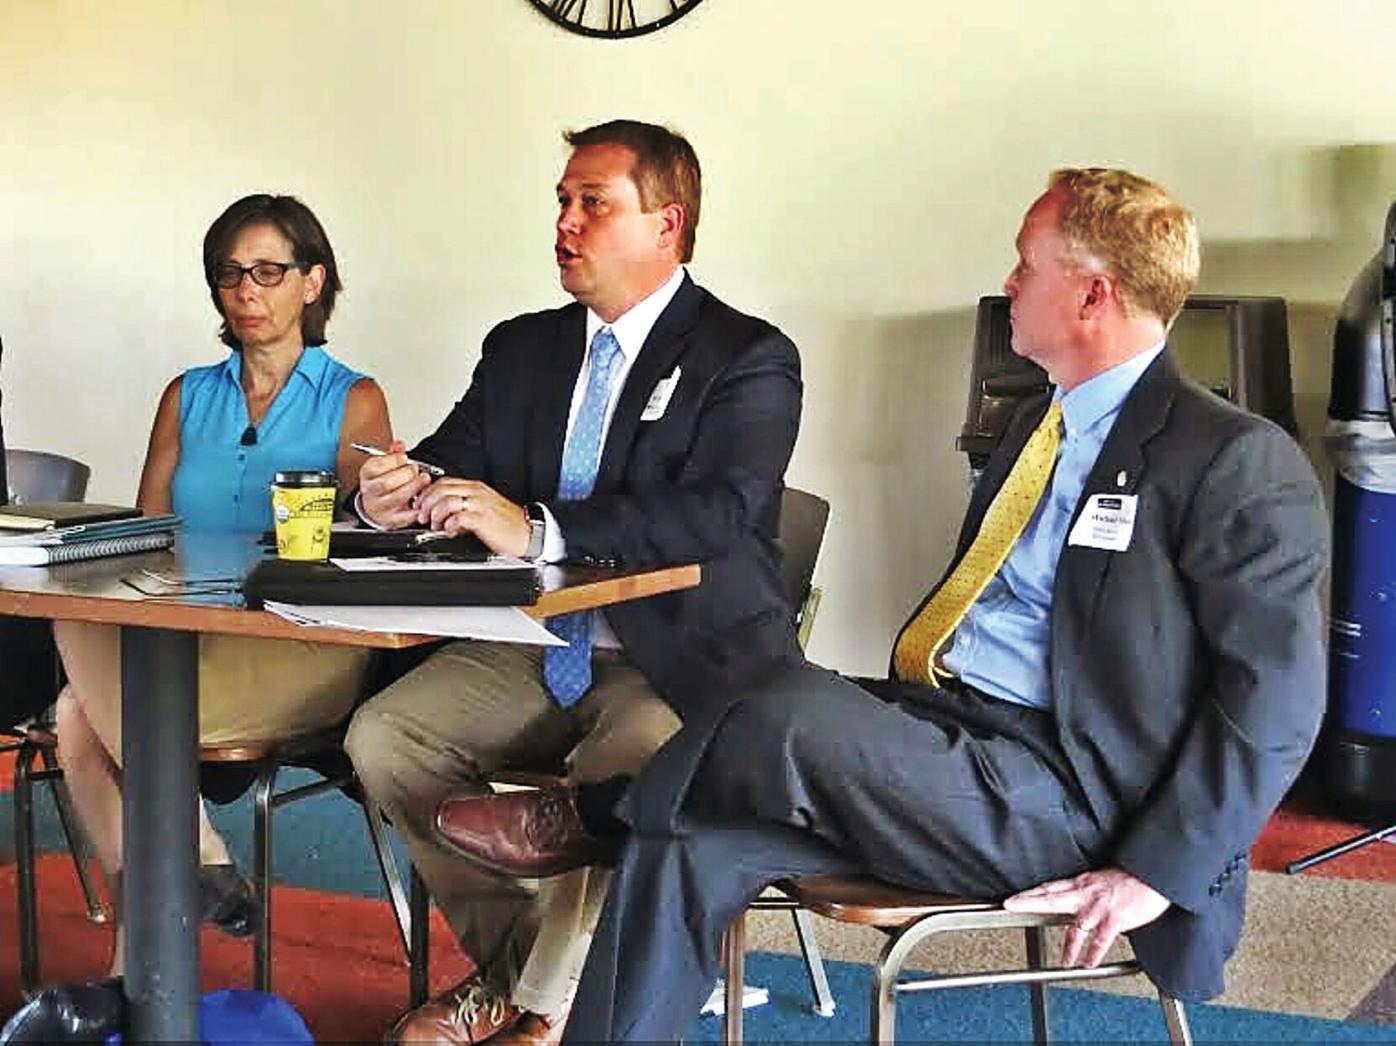 Southern Vermont summit focuses on development